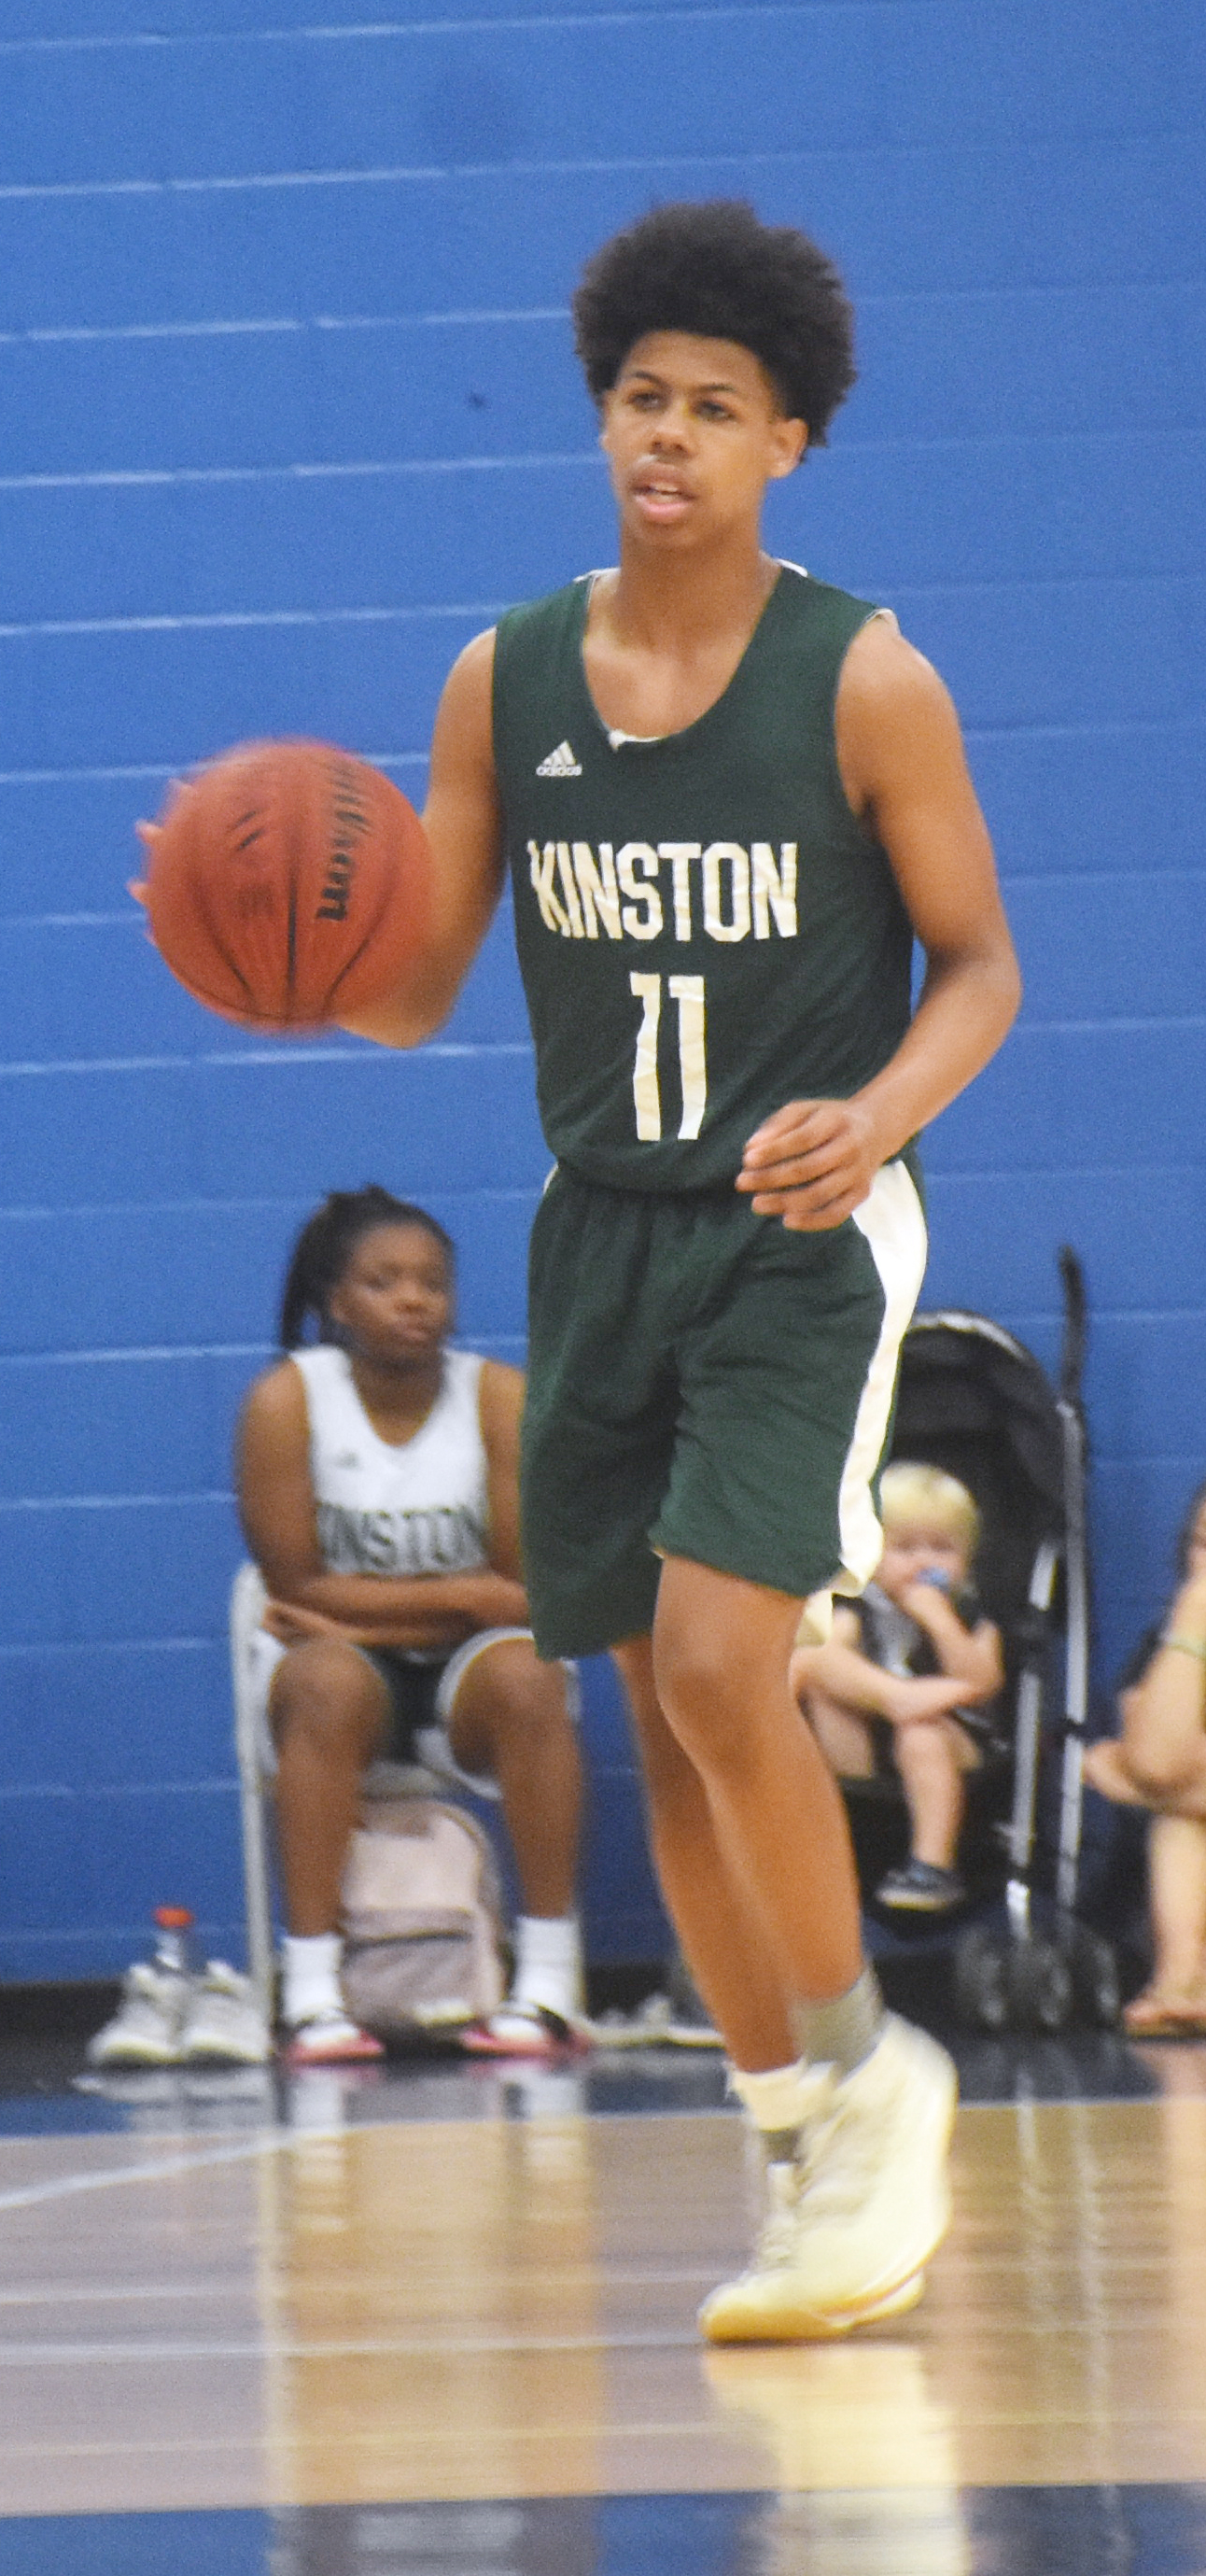 Kinston junior point guard Isaac Parson. Photo by Bryan Hanks / Neuse News